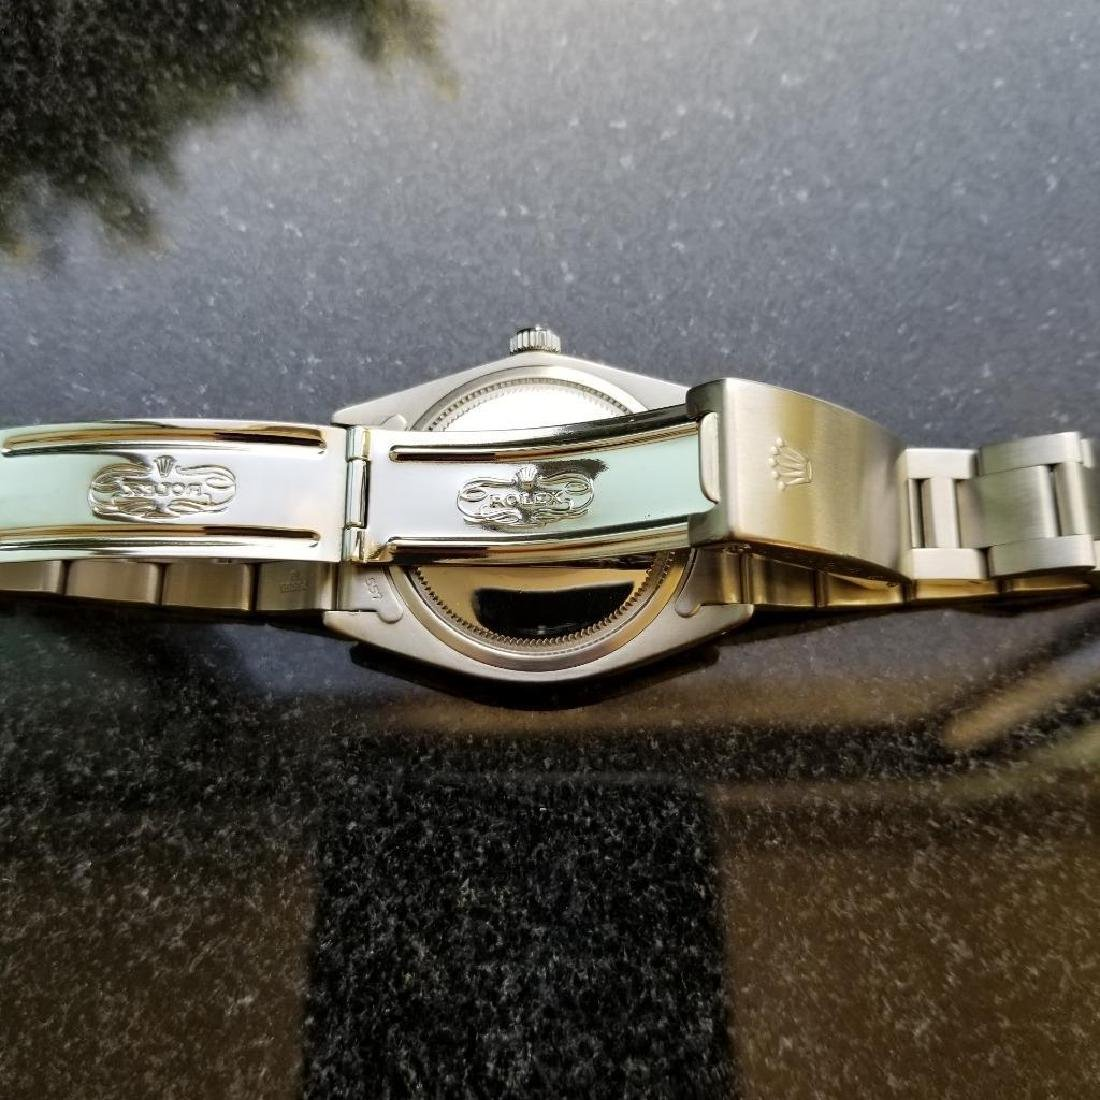 Rolex Vintage Precision Oysterdate 1954 6694 Manual - 7